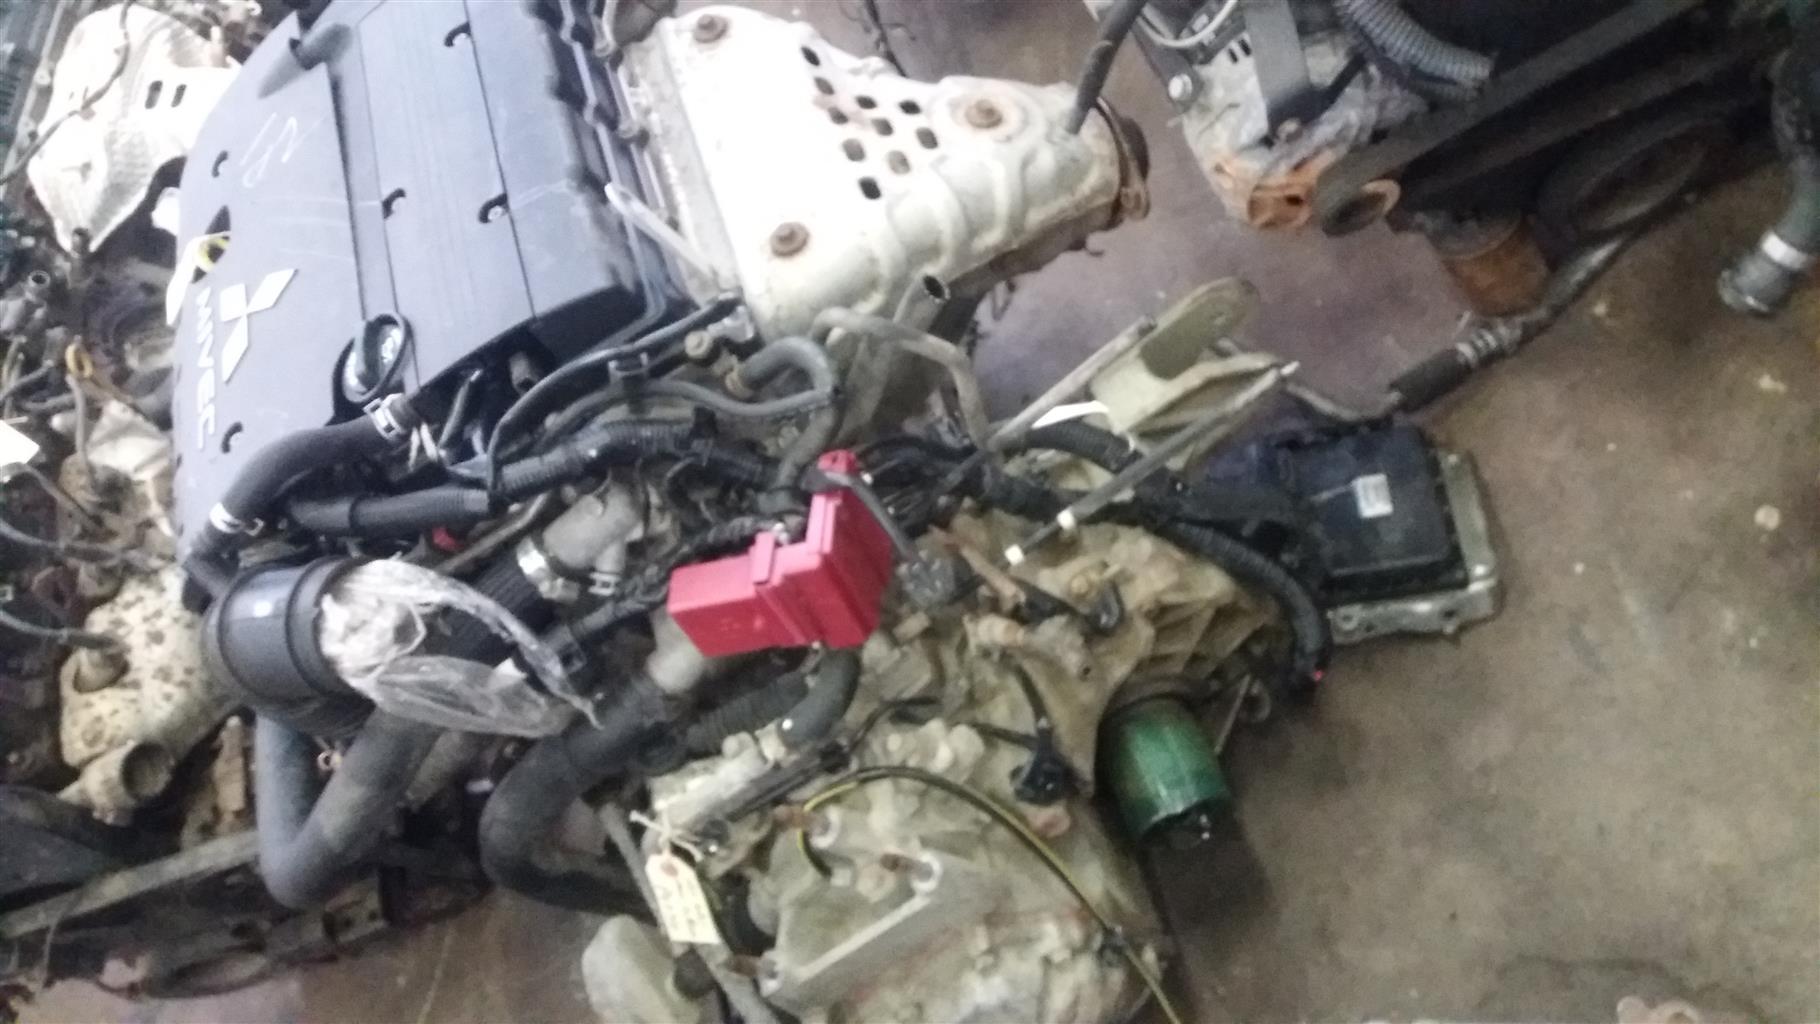 Mitsubishi 2.4 16V VVTi Engine #4B11